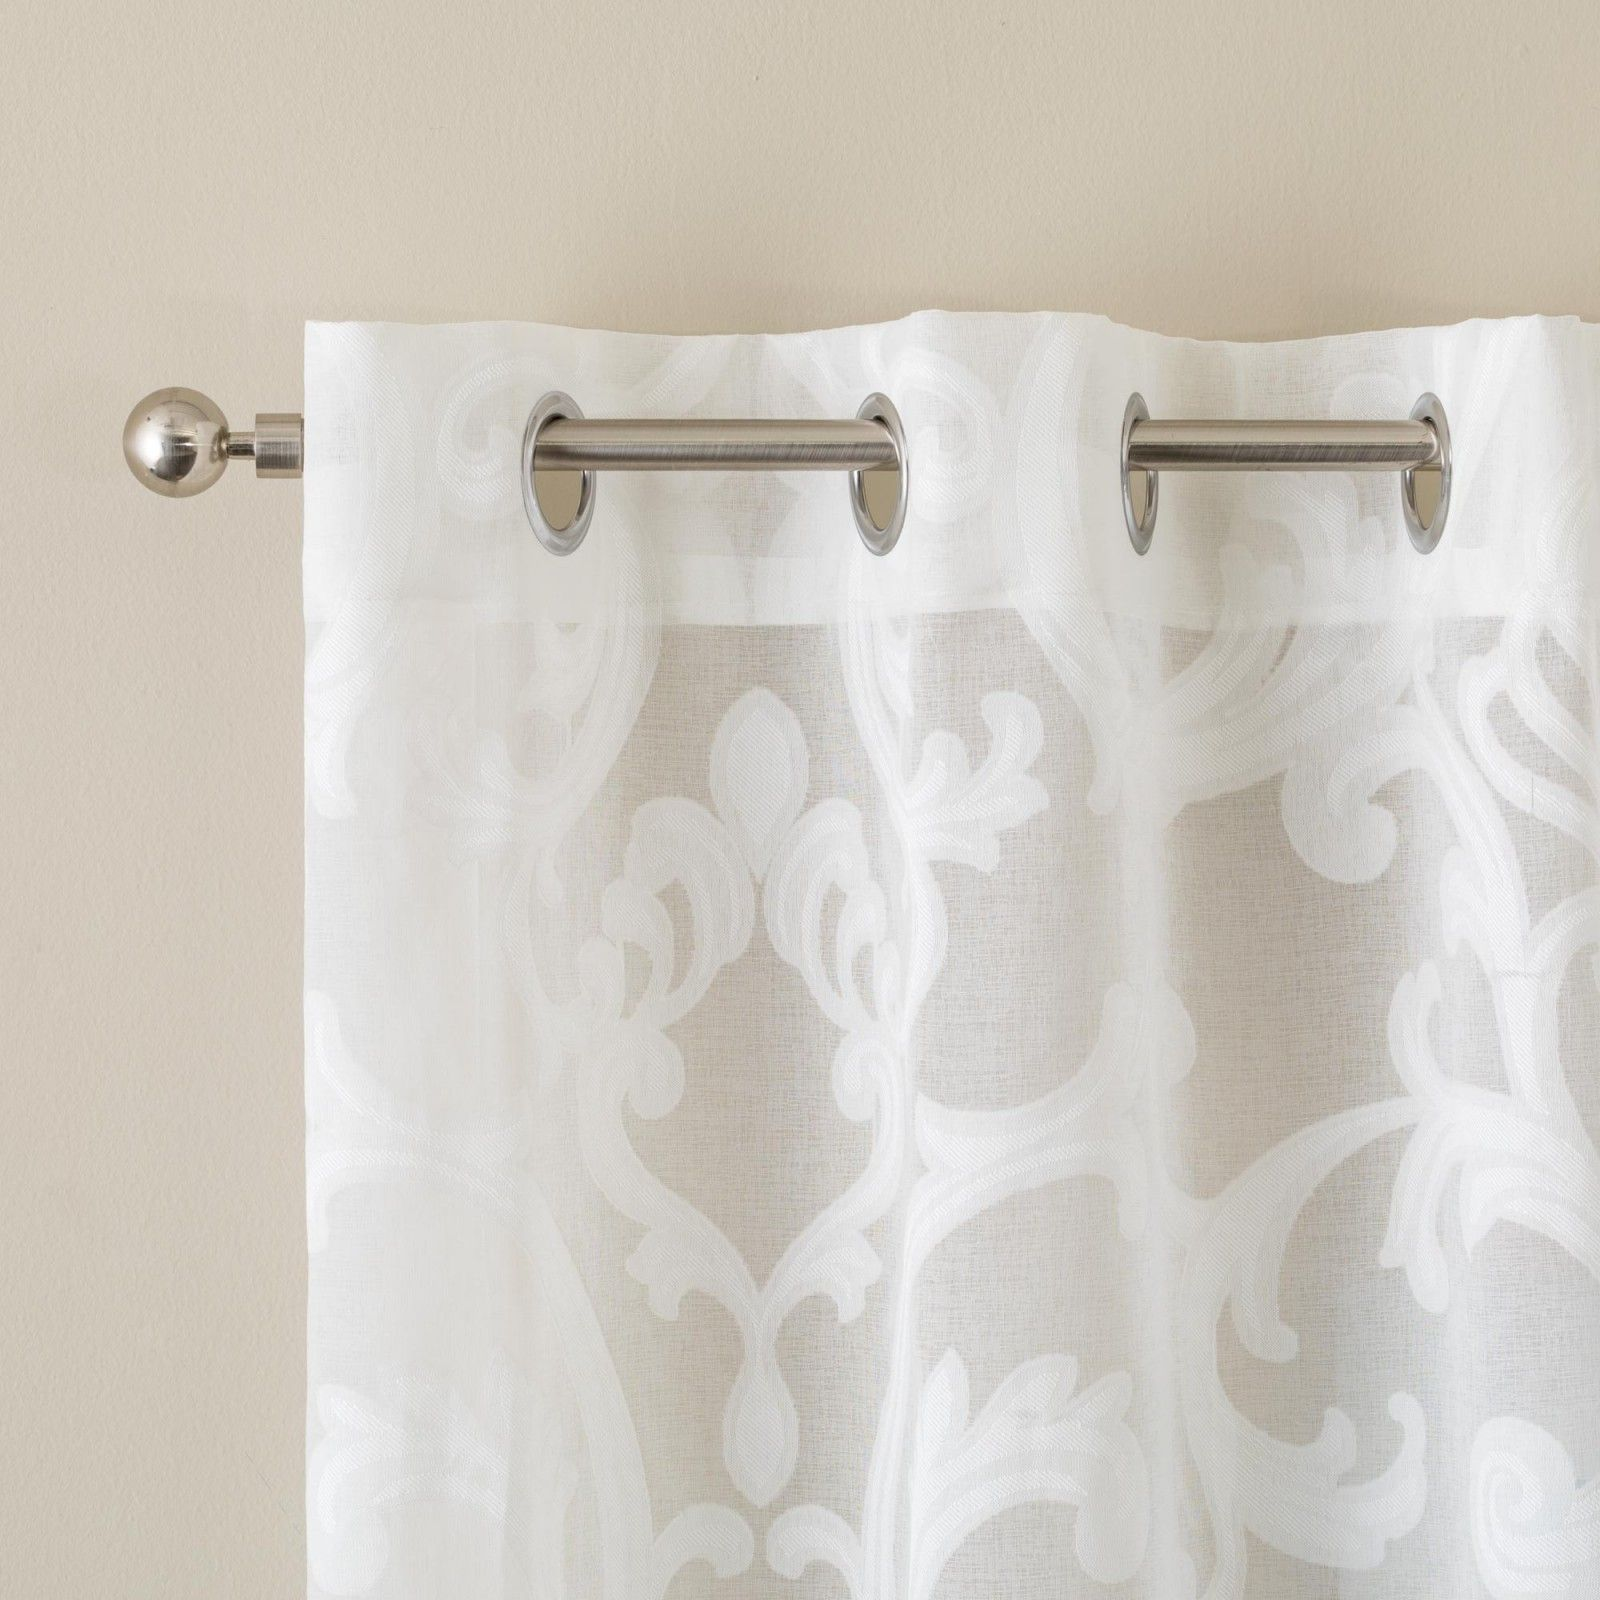 Jacquard Iowa Towel set 1+1